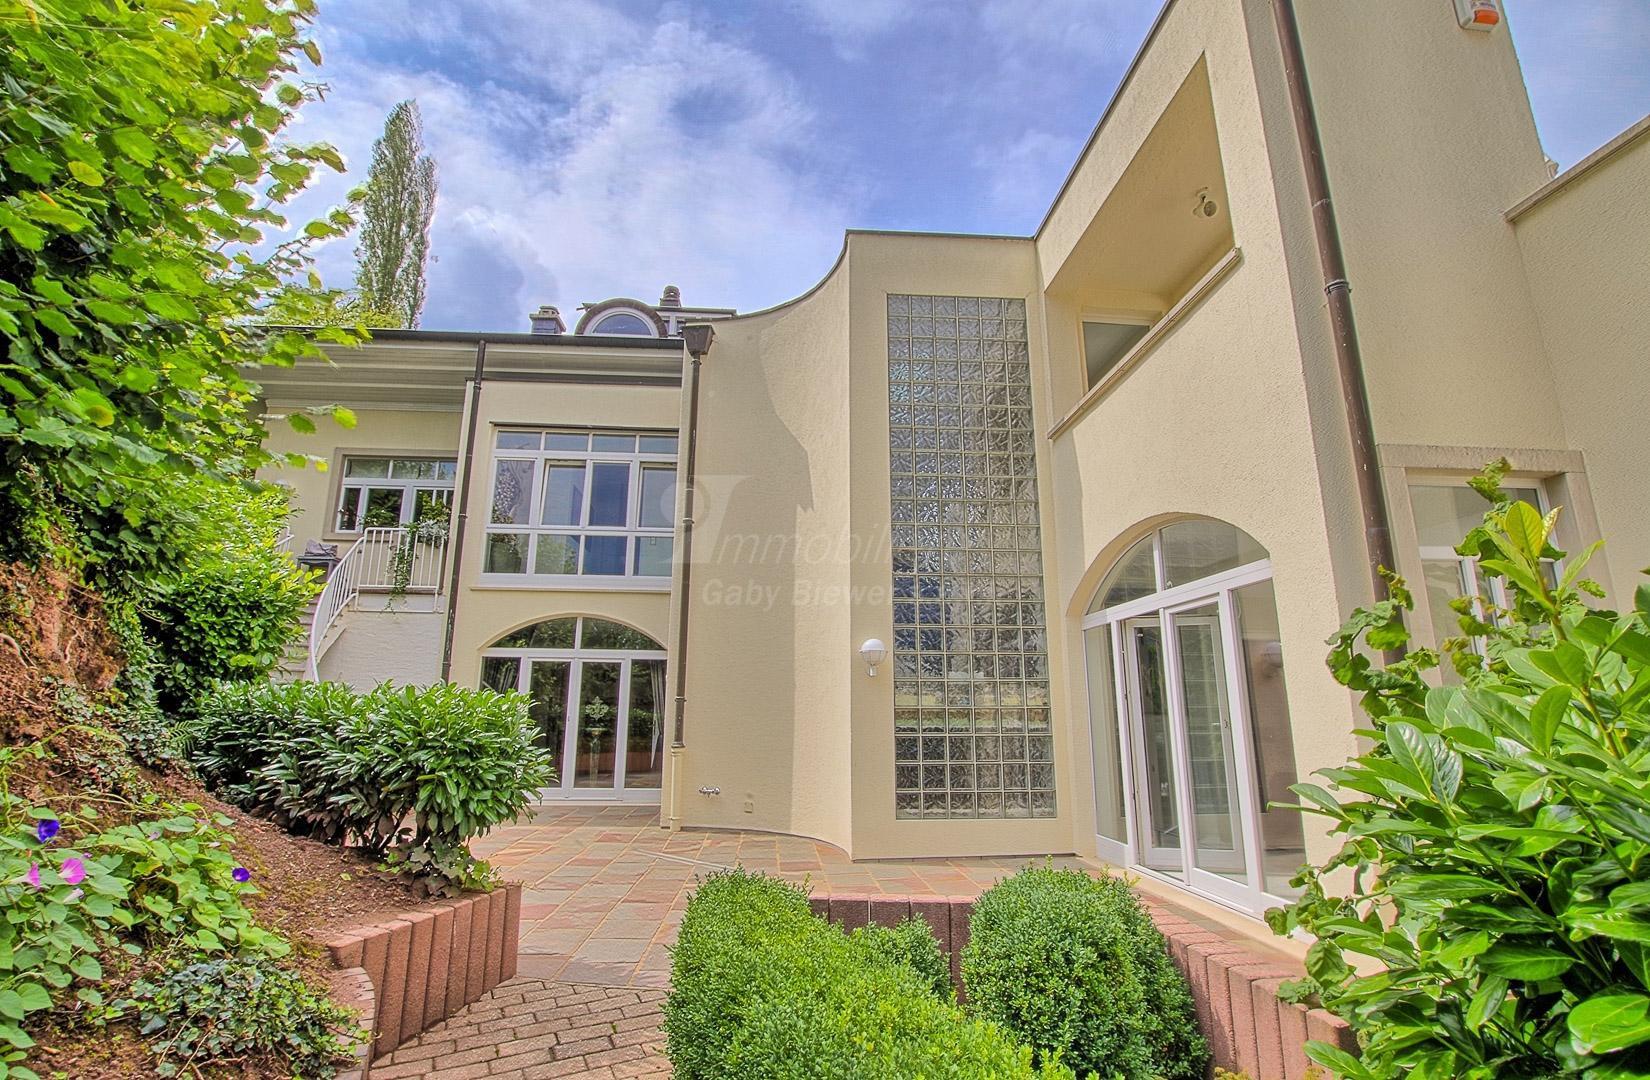 Verkauf Haus - Diekirch - Luxemburg